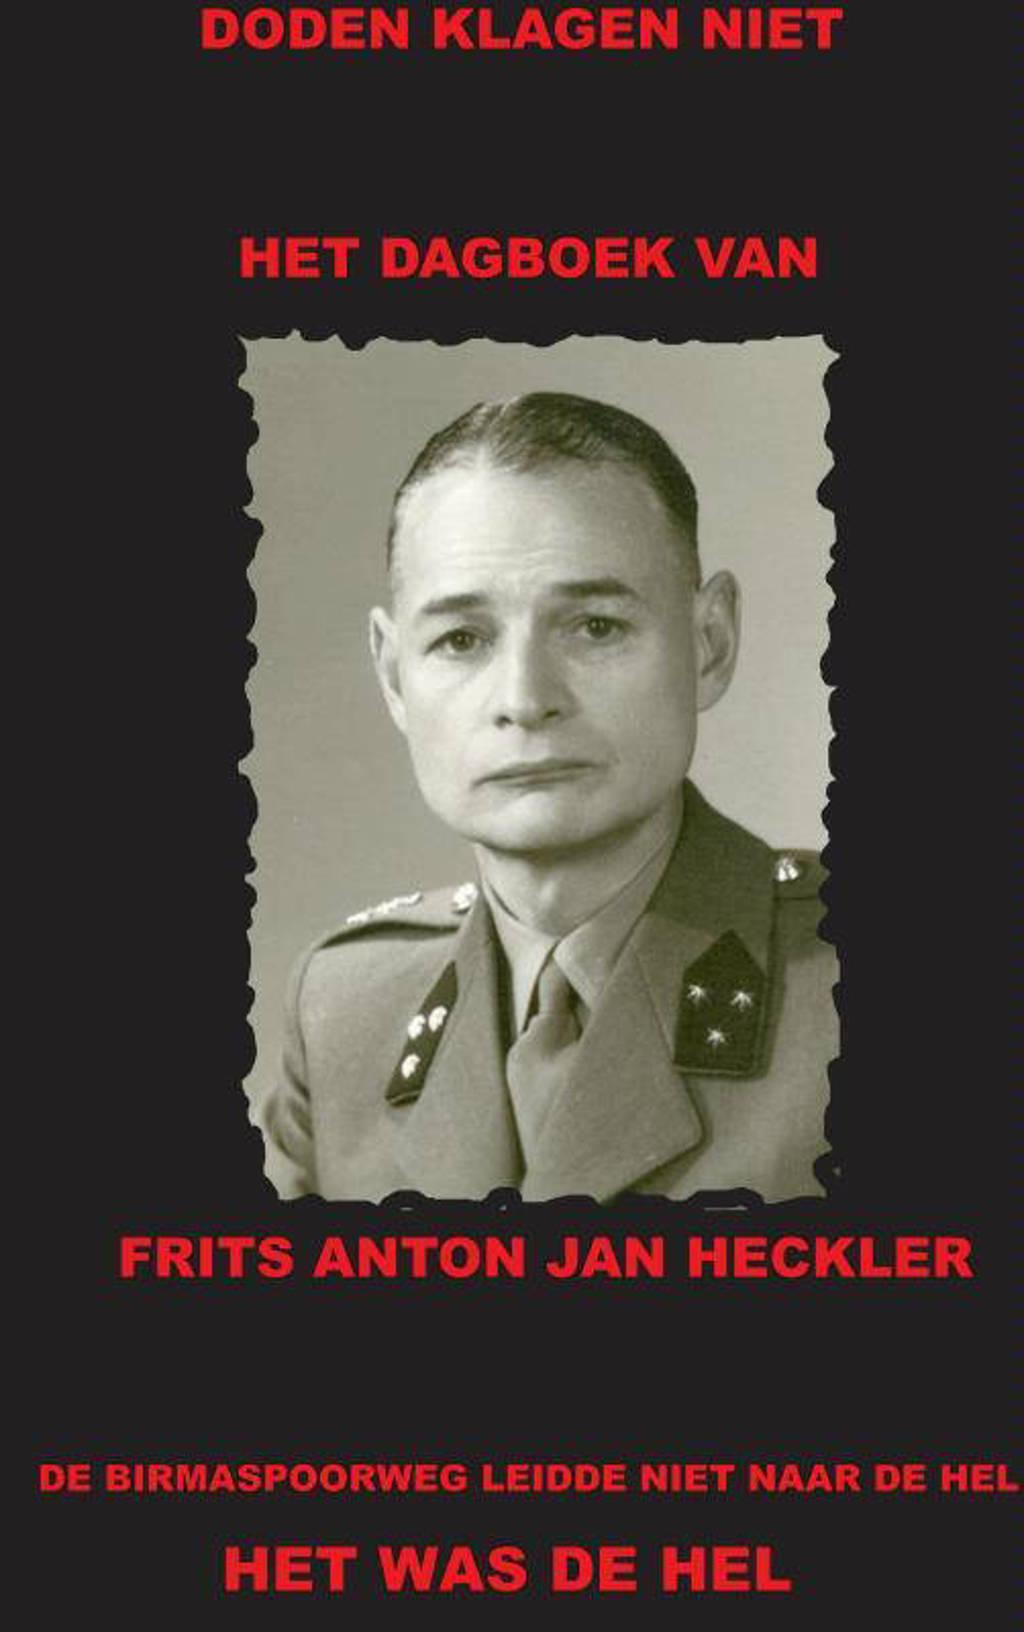 Het dagboek van Frits Anton Jan Heckler - F.A.J. Heckler